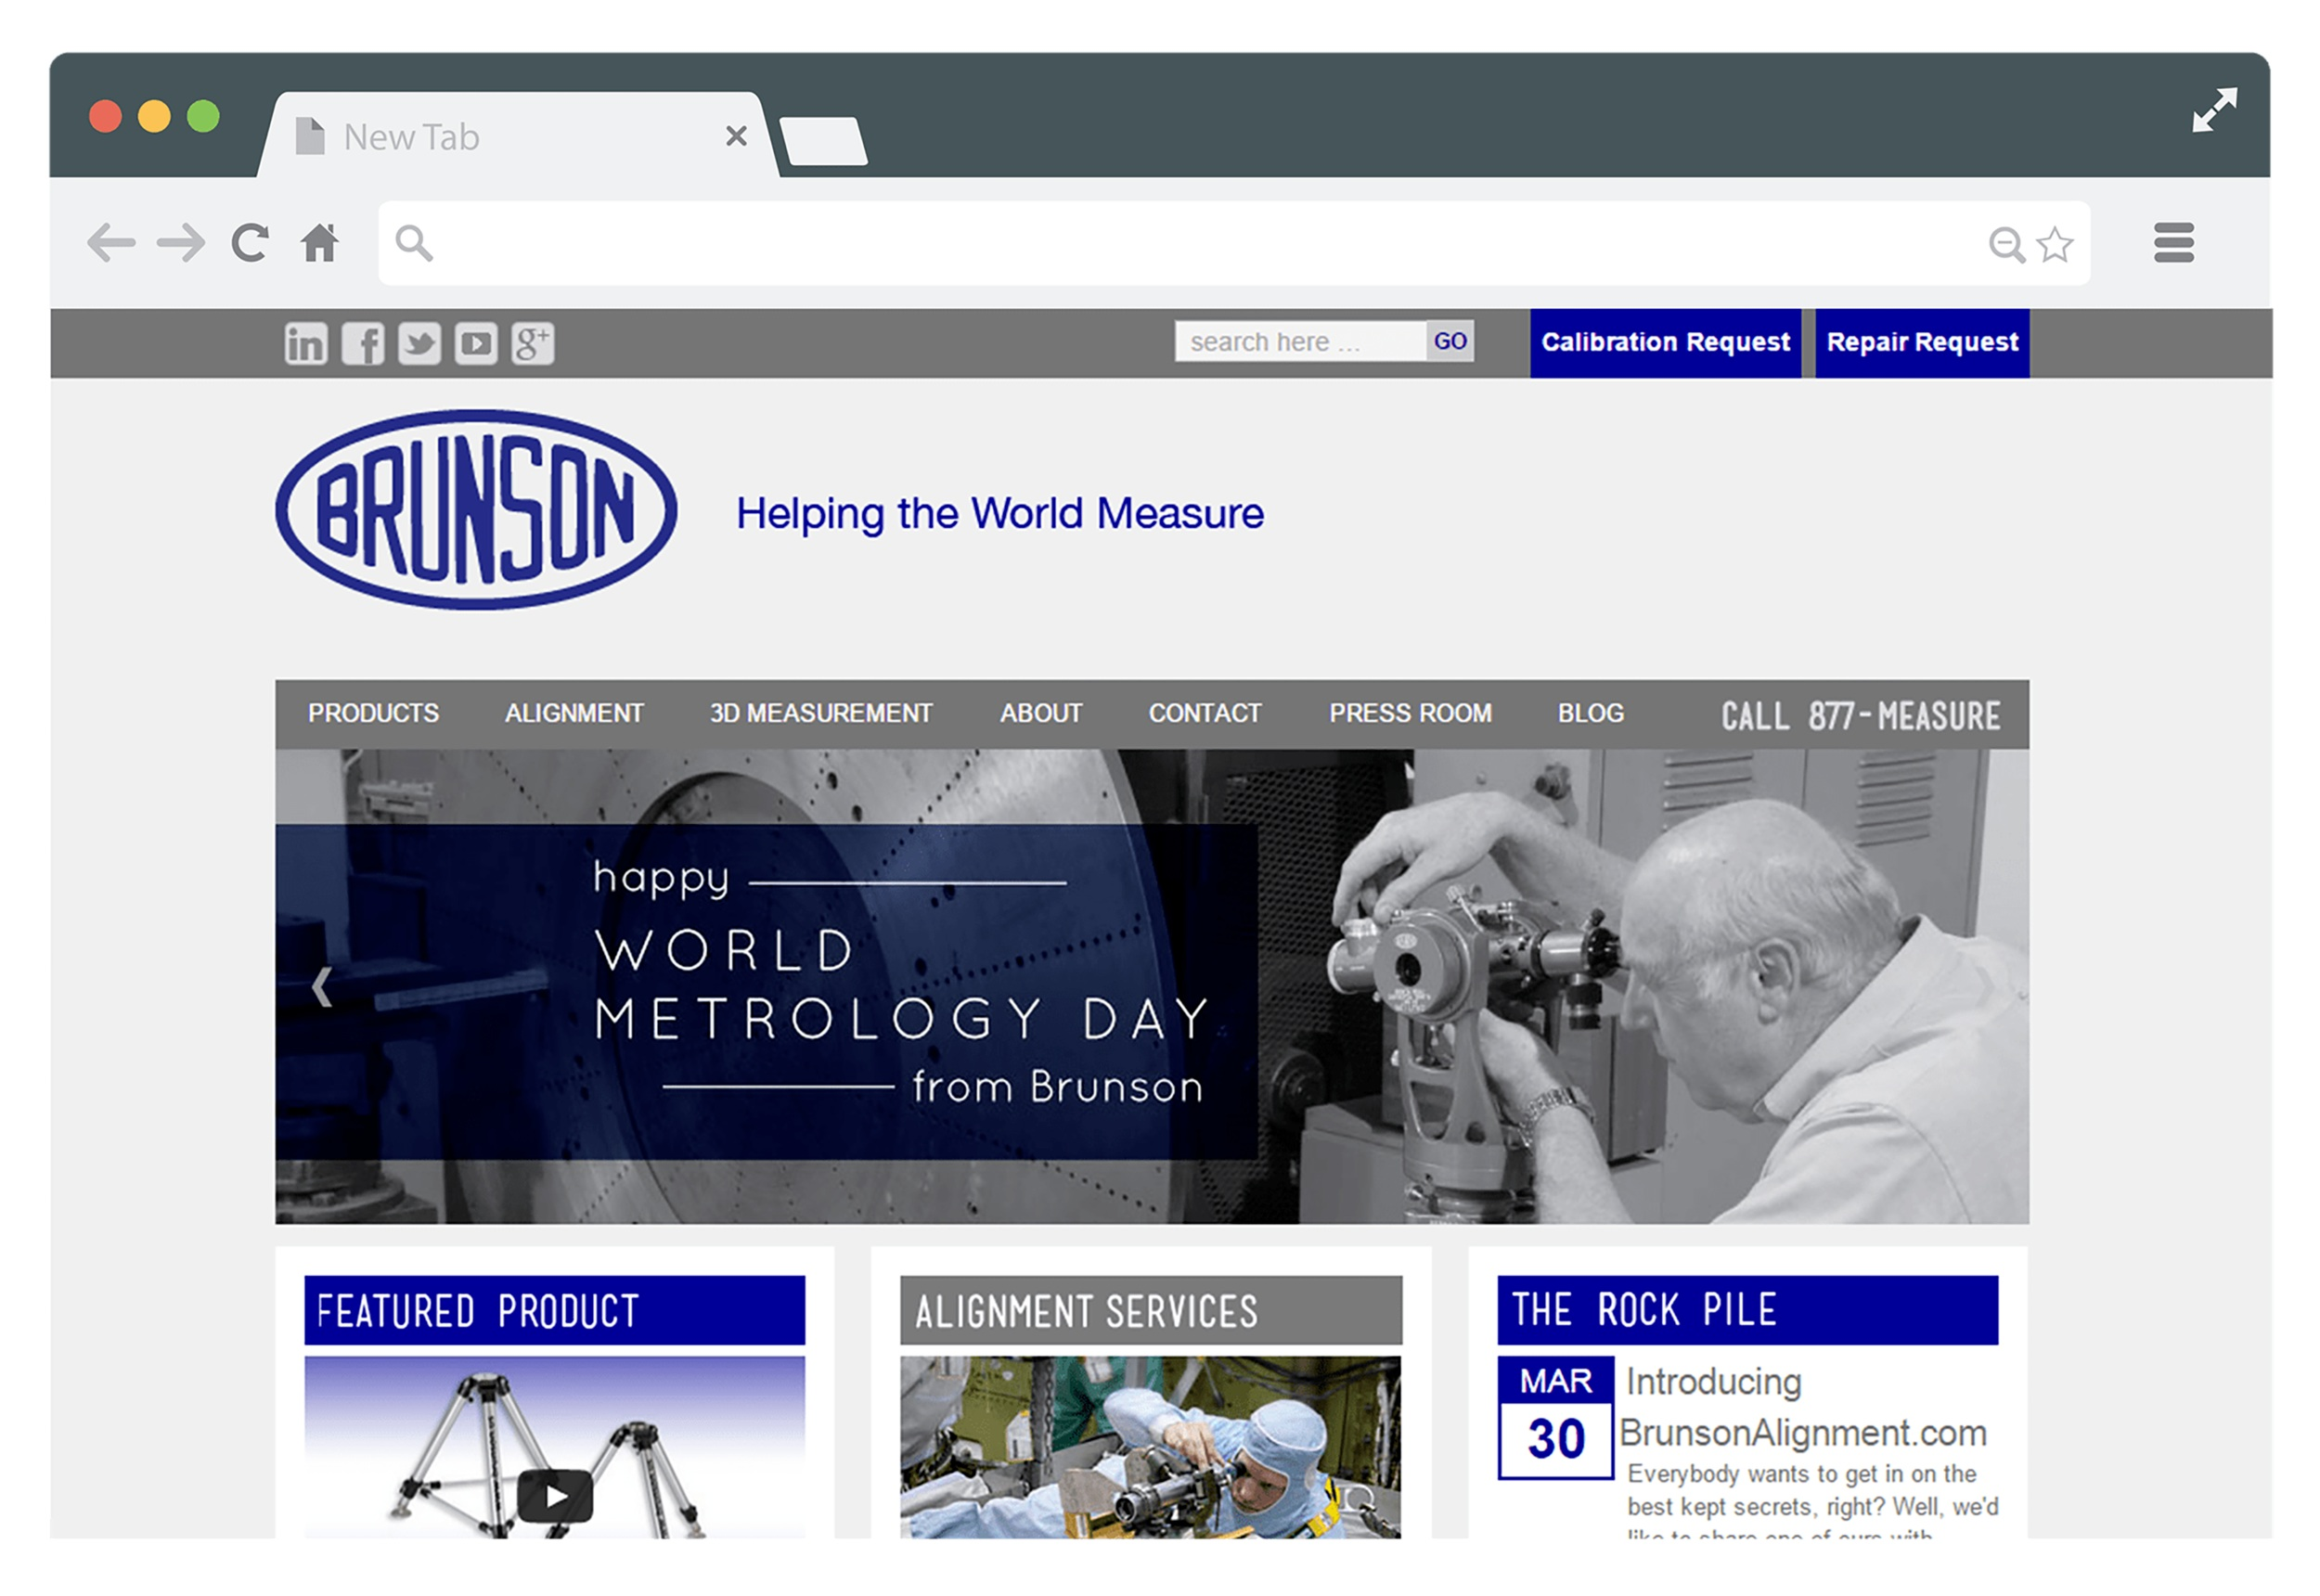 brunson-website.jpg